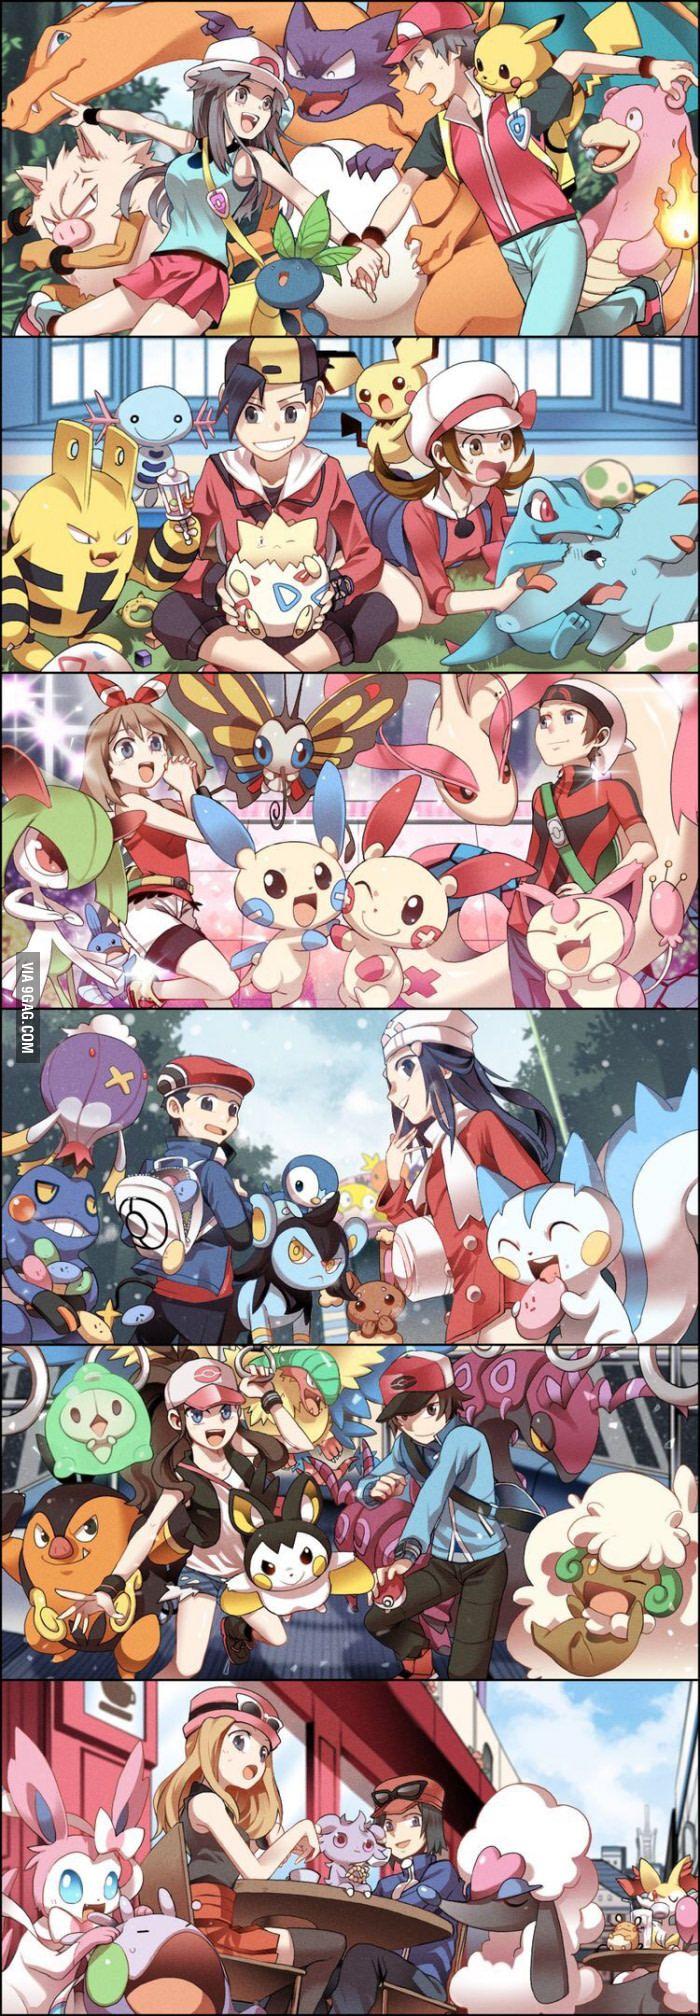 The Pokemon regions